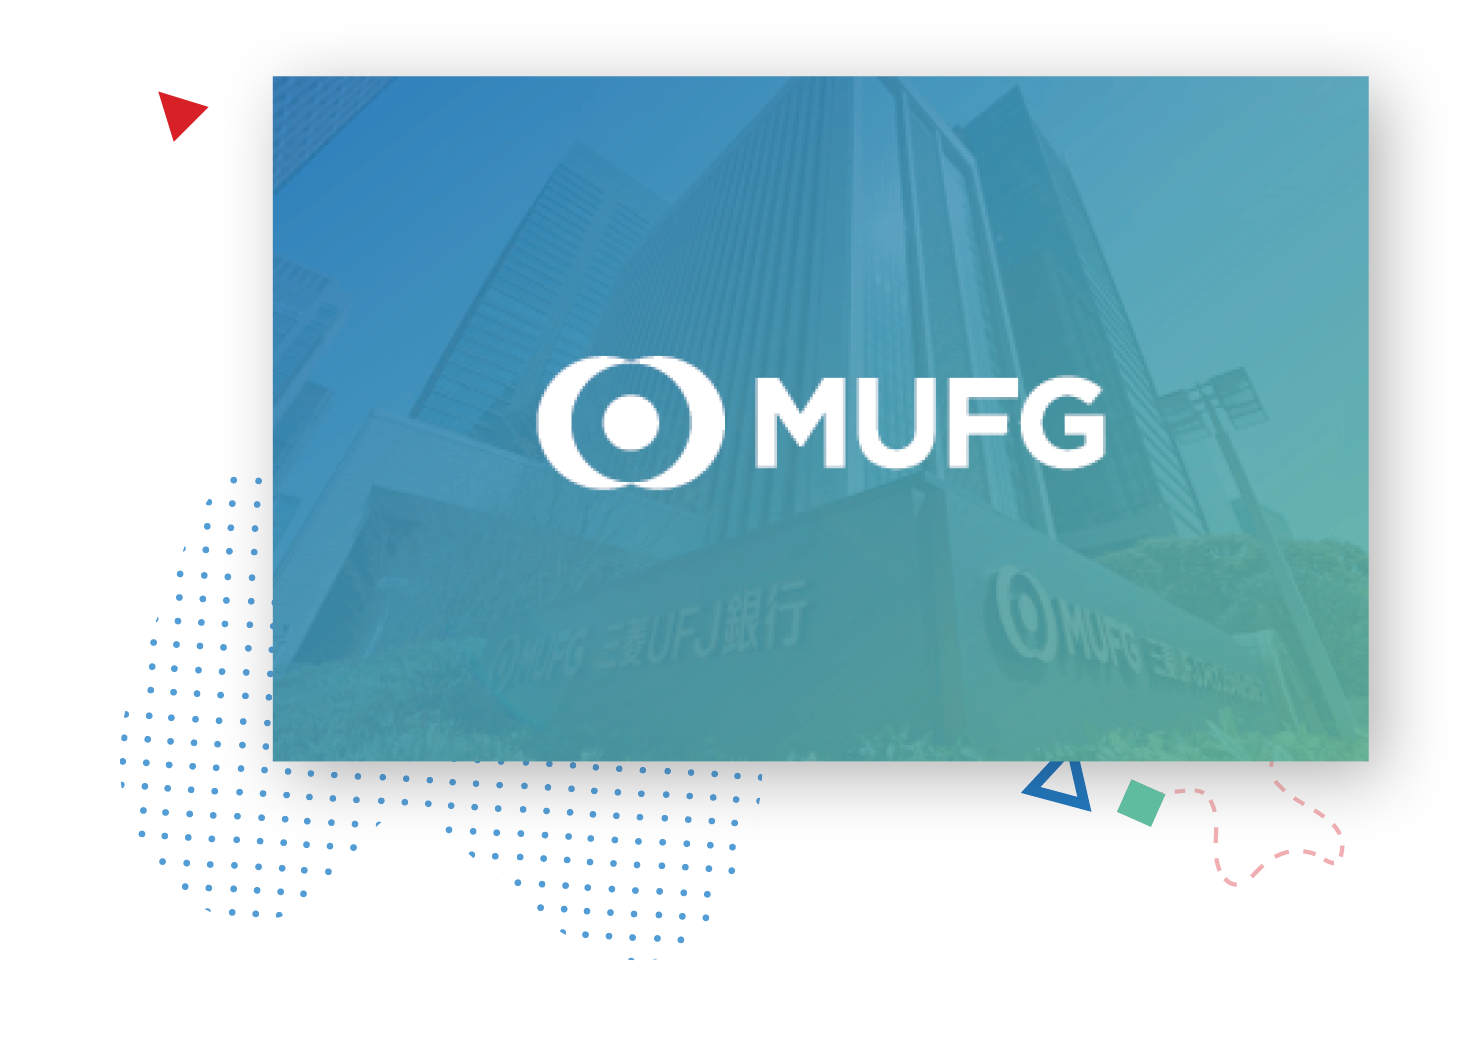 MUFG Case Study